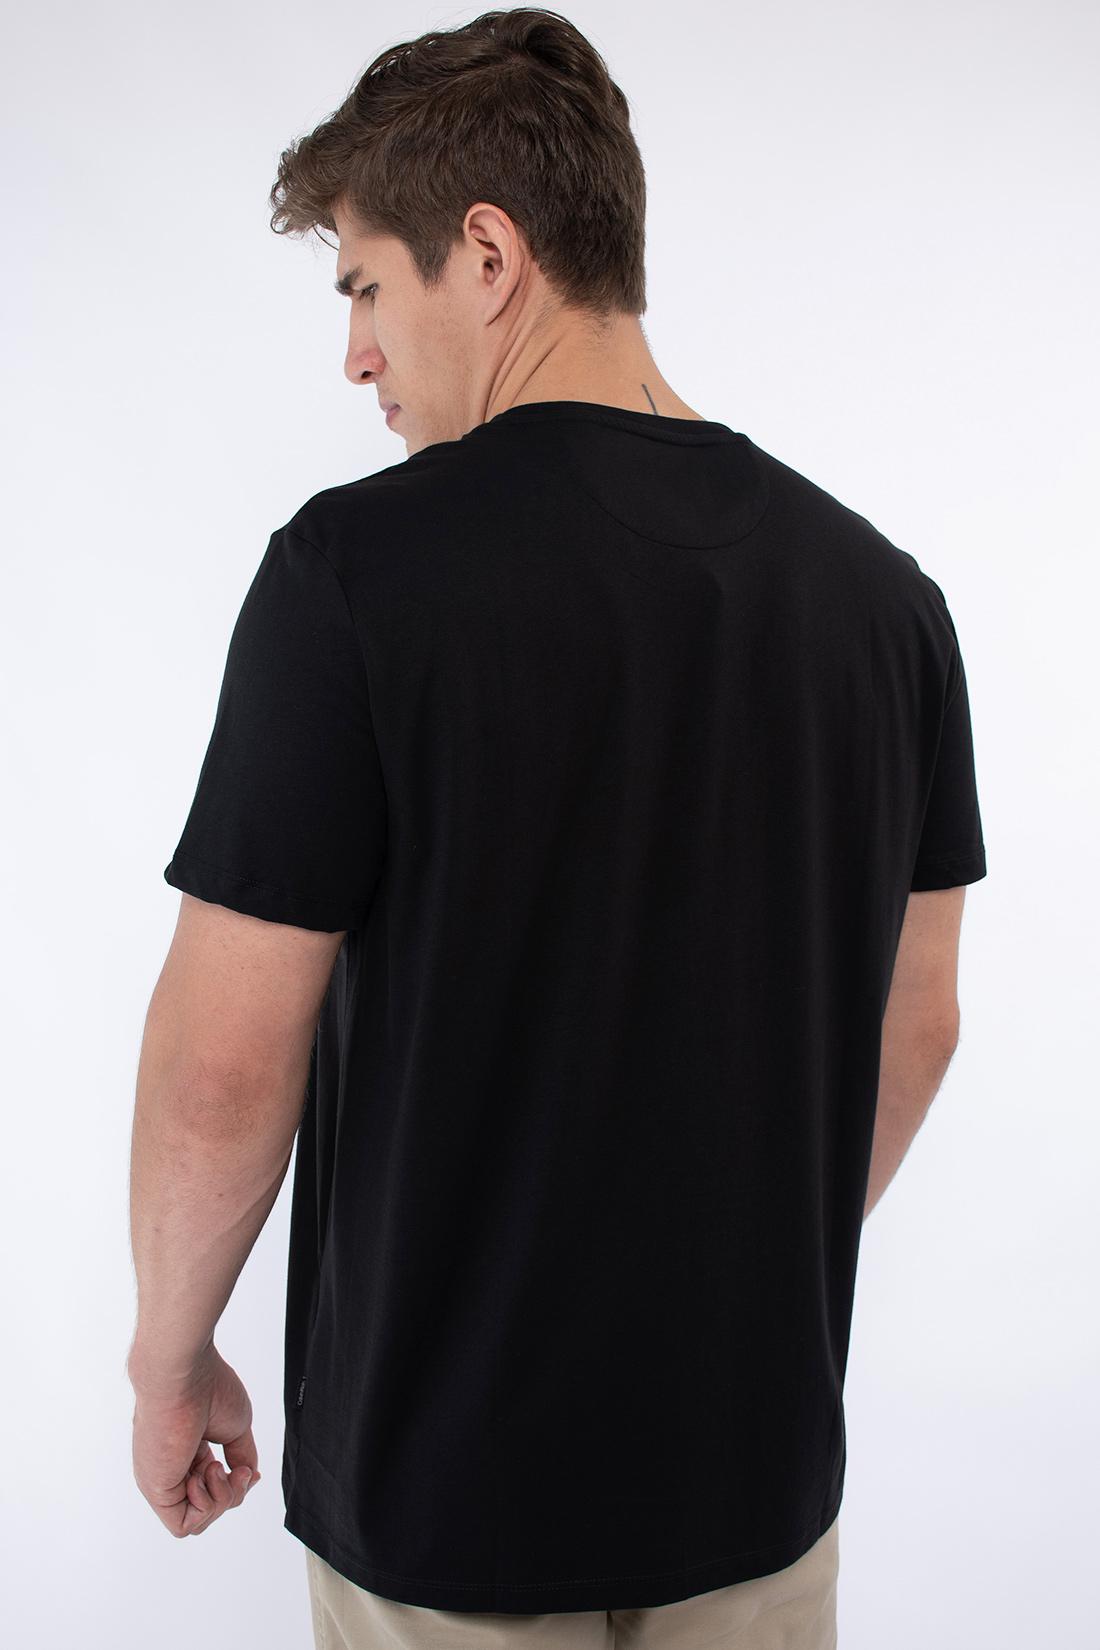 Camiseta Mc Colcci Authenticity Is Everything